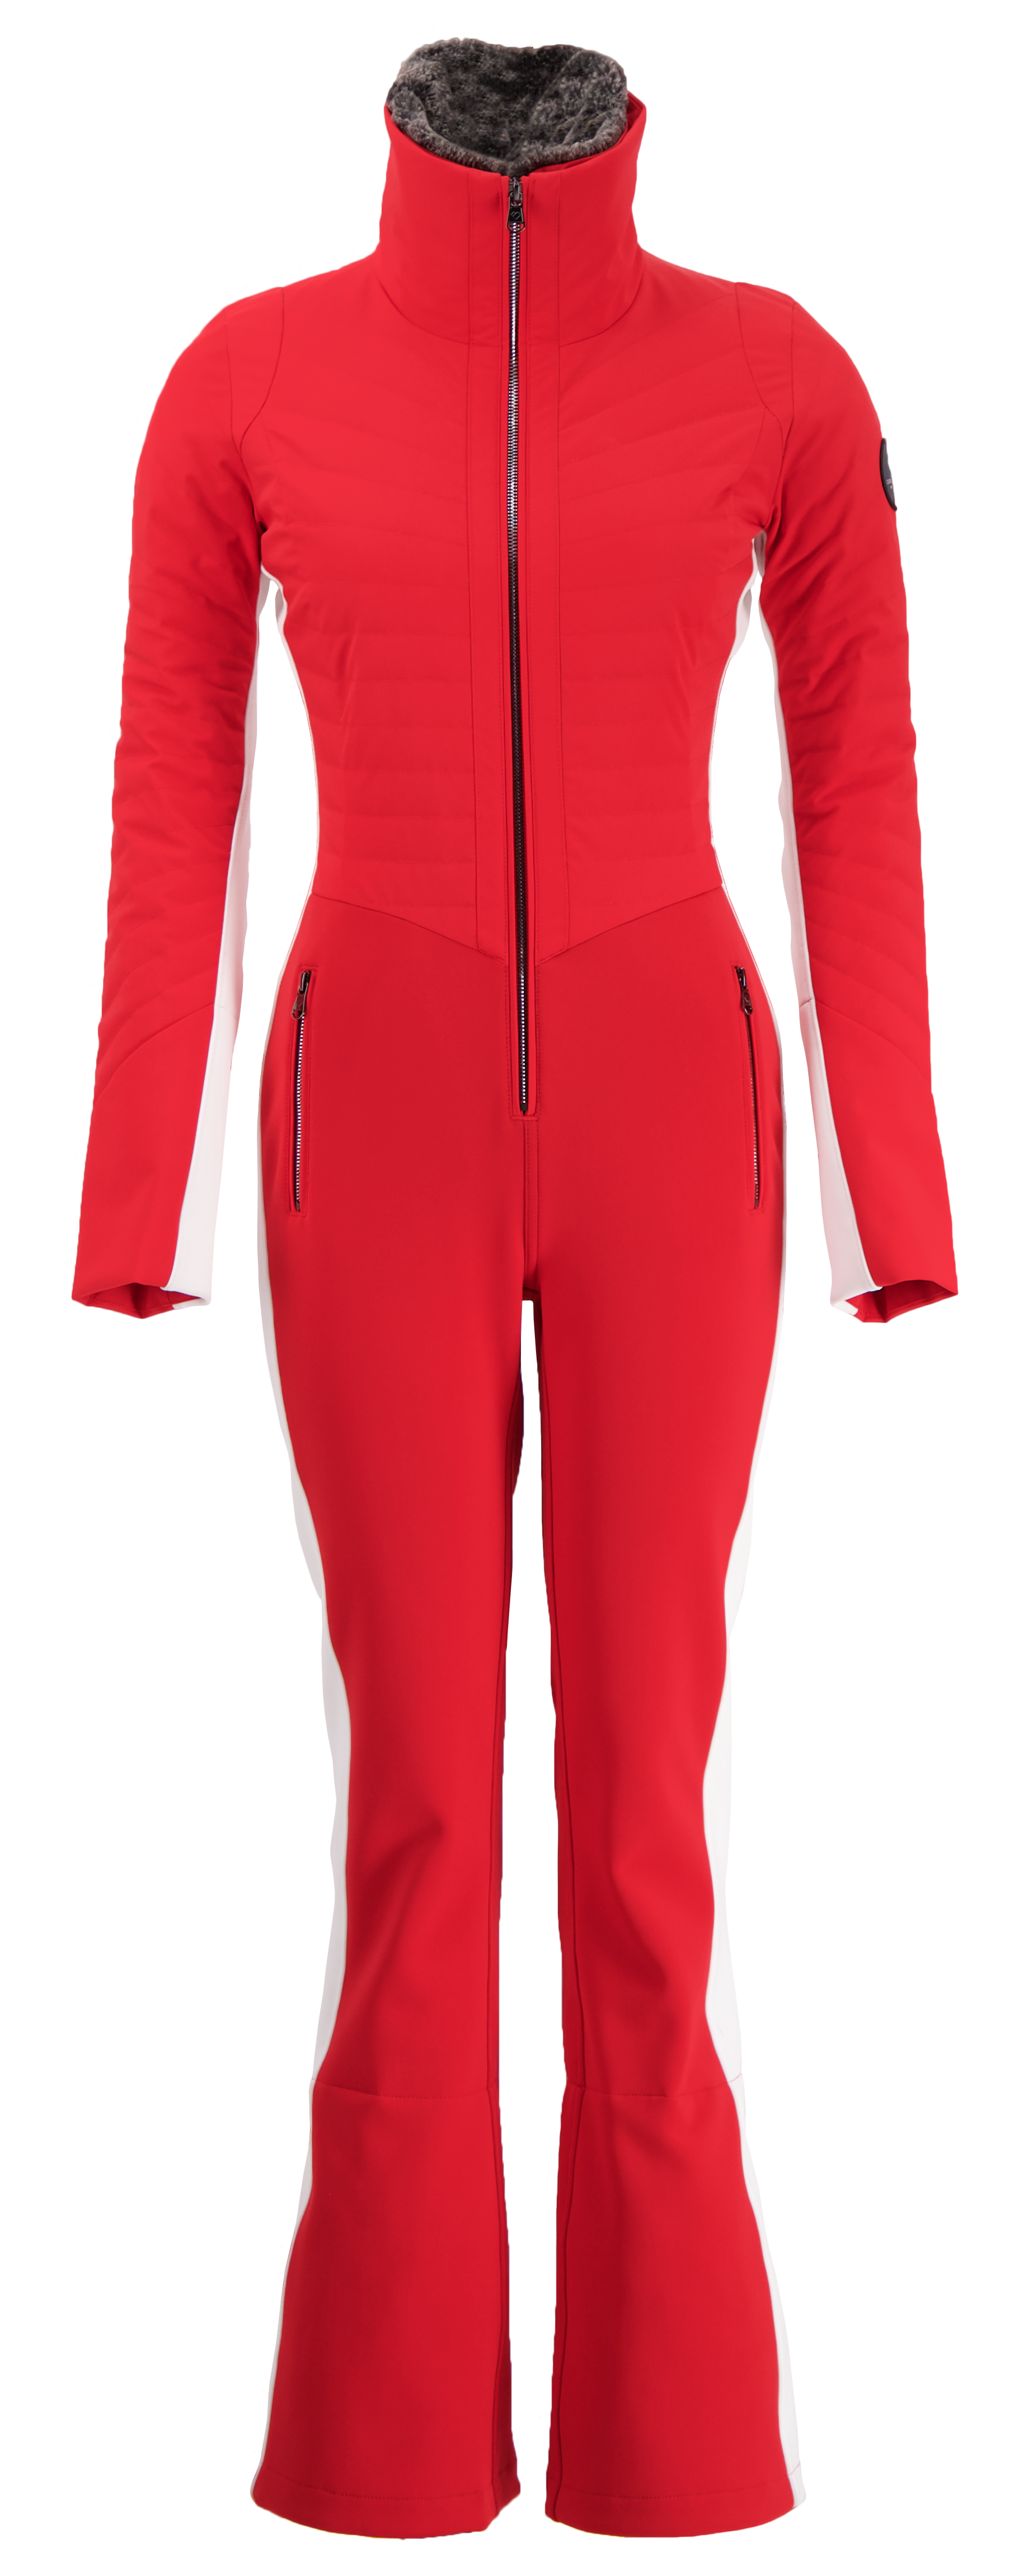 SkyTec Interactive Ski Trainer